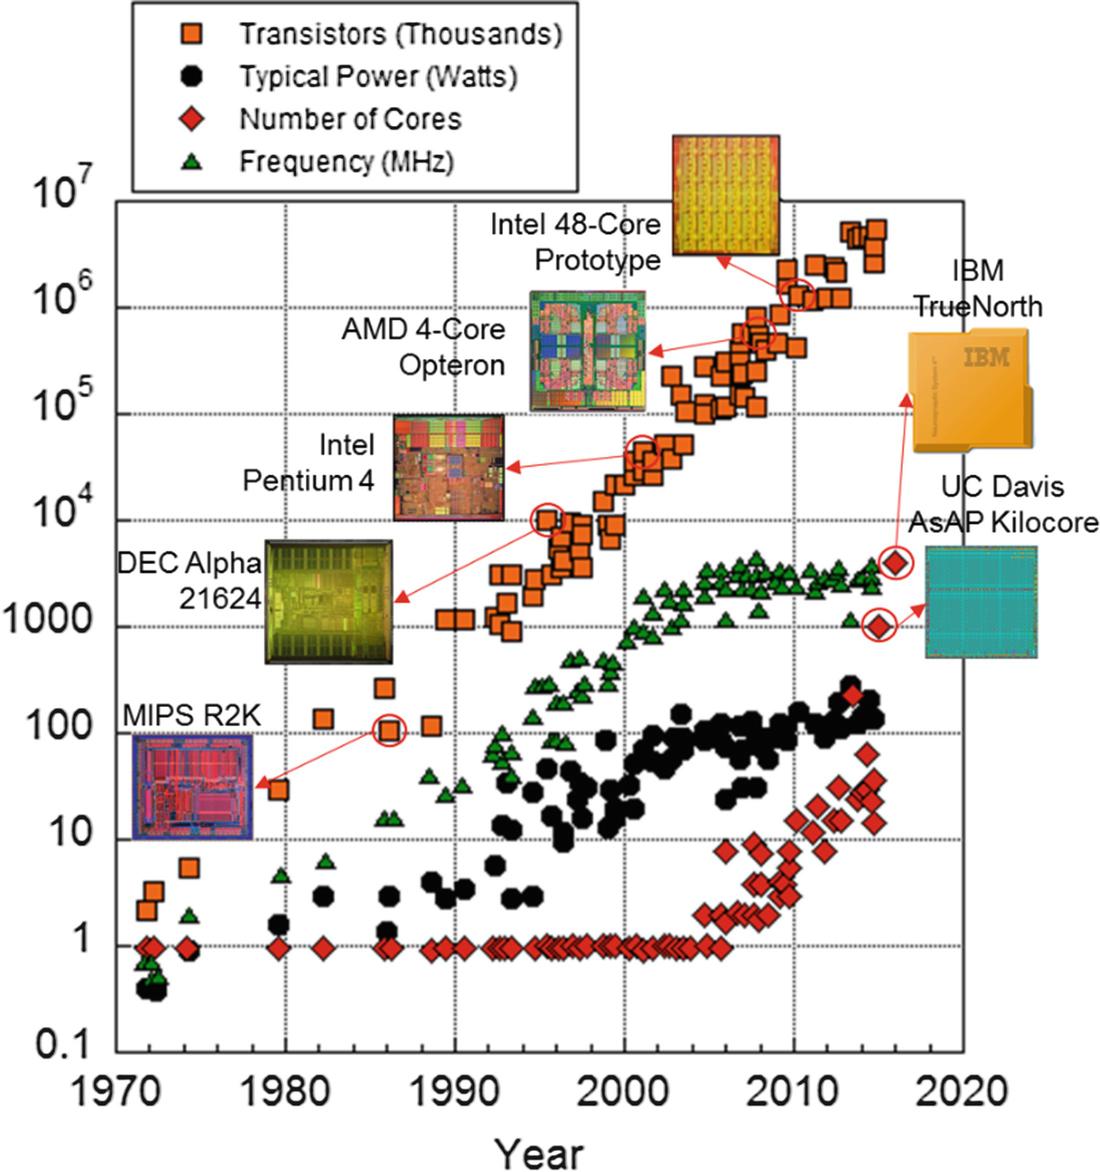 Photonics in Data Centers | SpringerLink